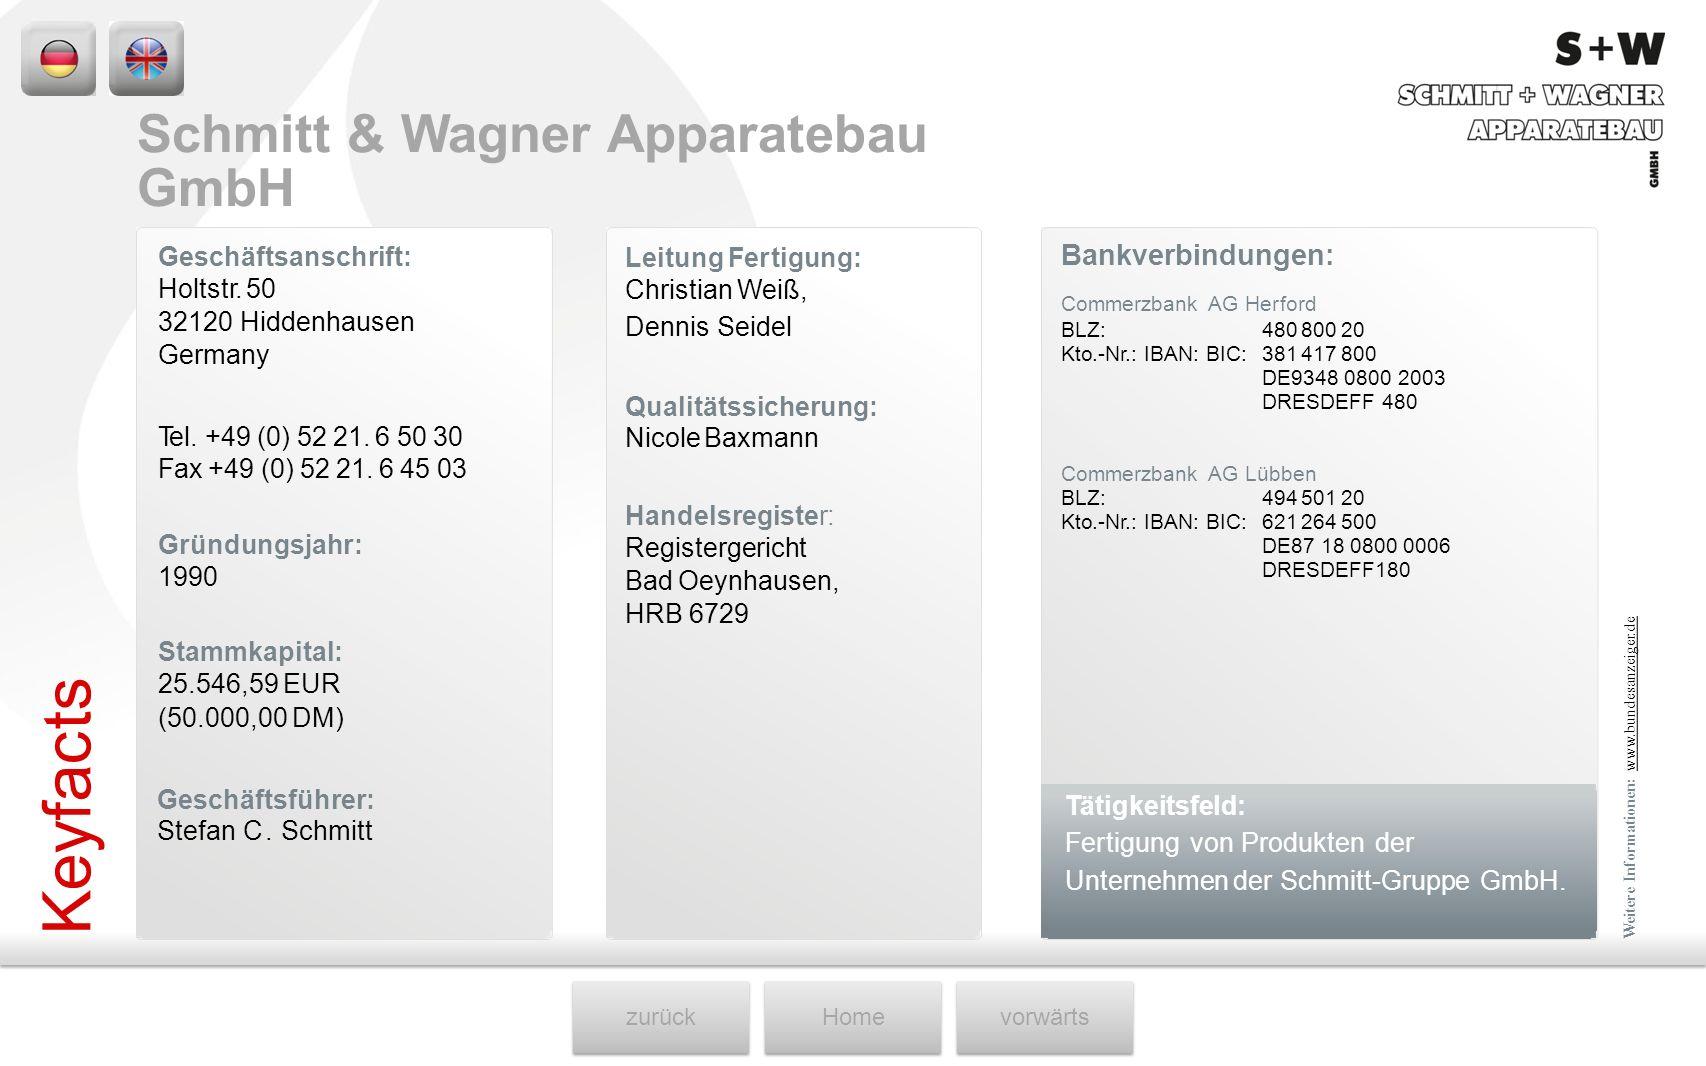 Keyfacts Schmitt & Wagner Apparatebau GmbH Bankverbindungen: